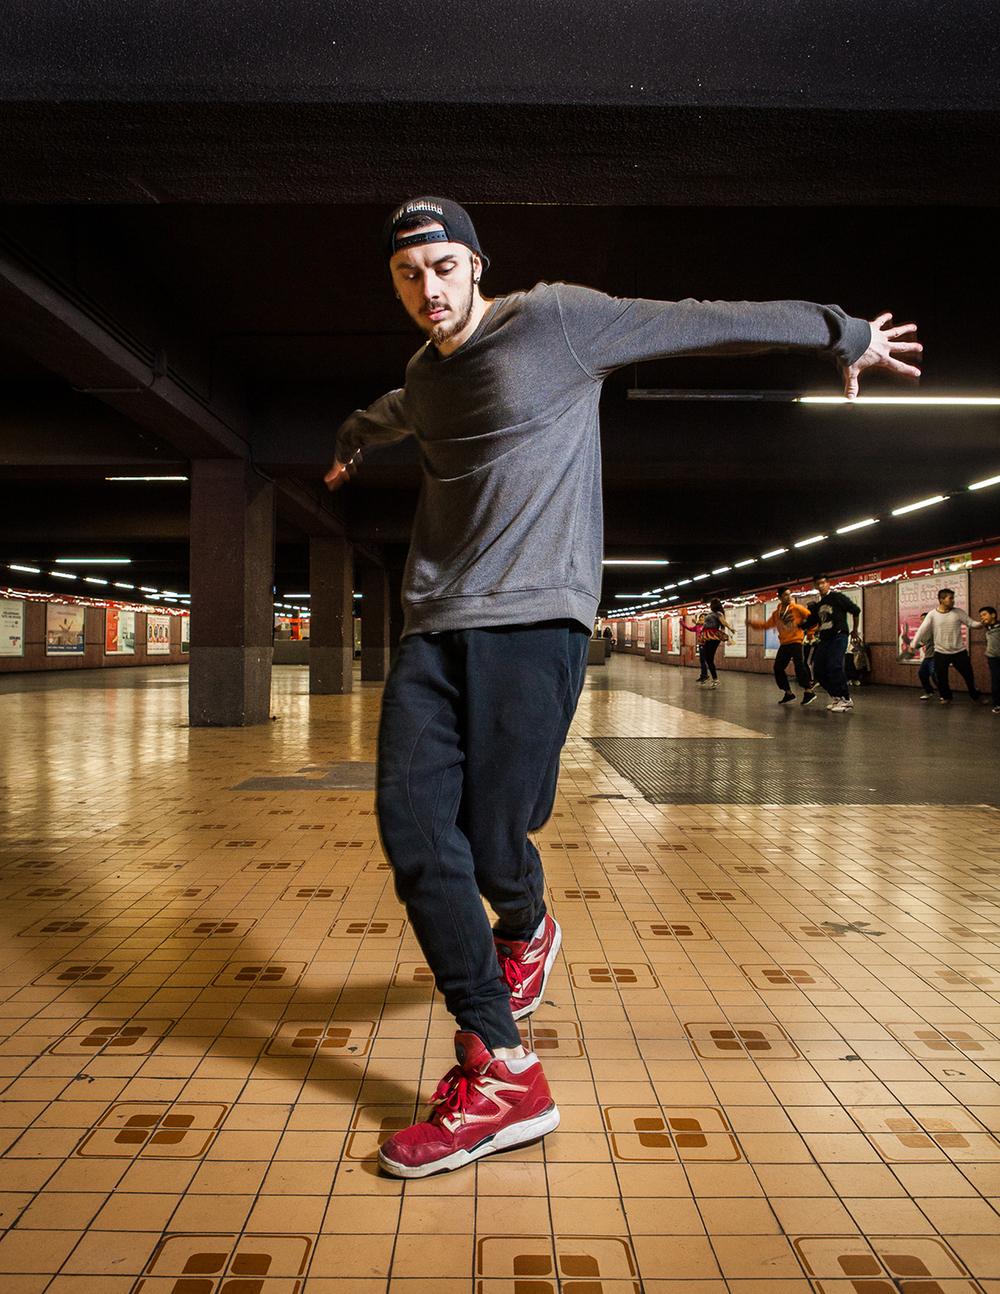 streetdance 13.jpg